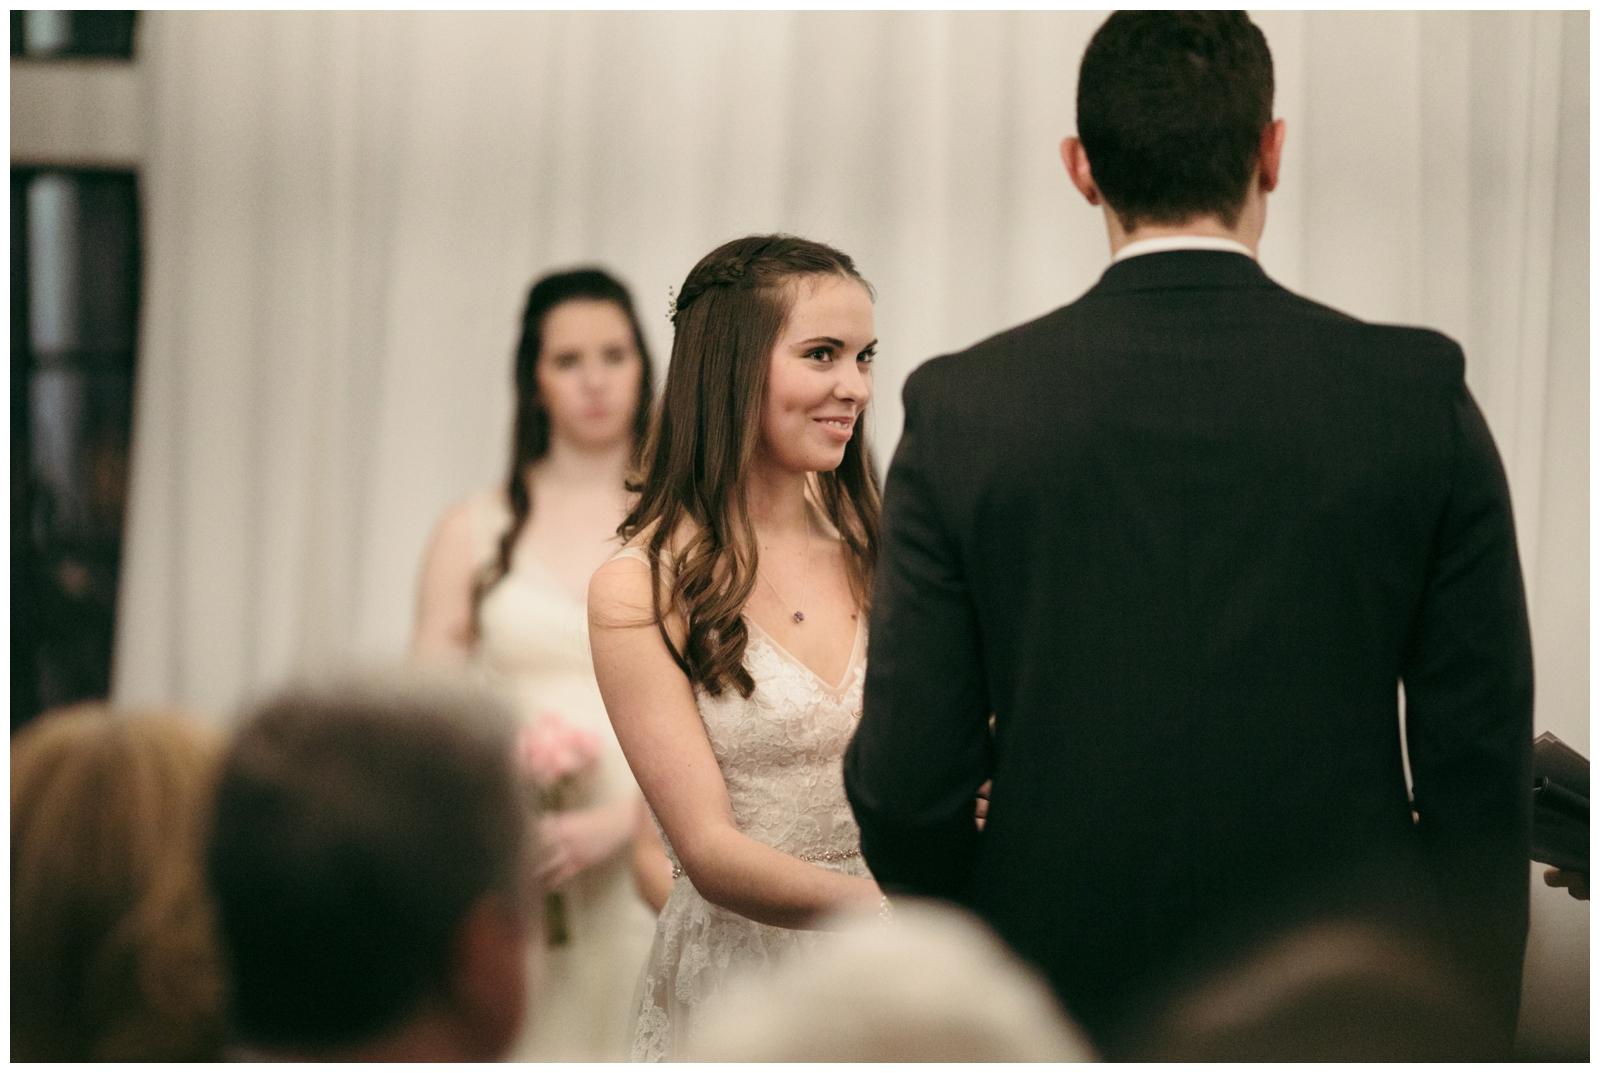 Alden-Castle-Wedding-Boston-Bailey-Q-Photo-020.jpg